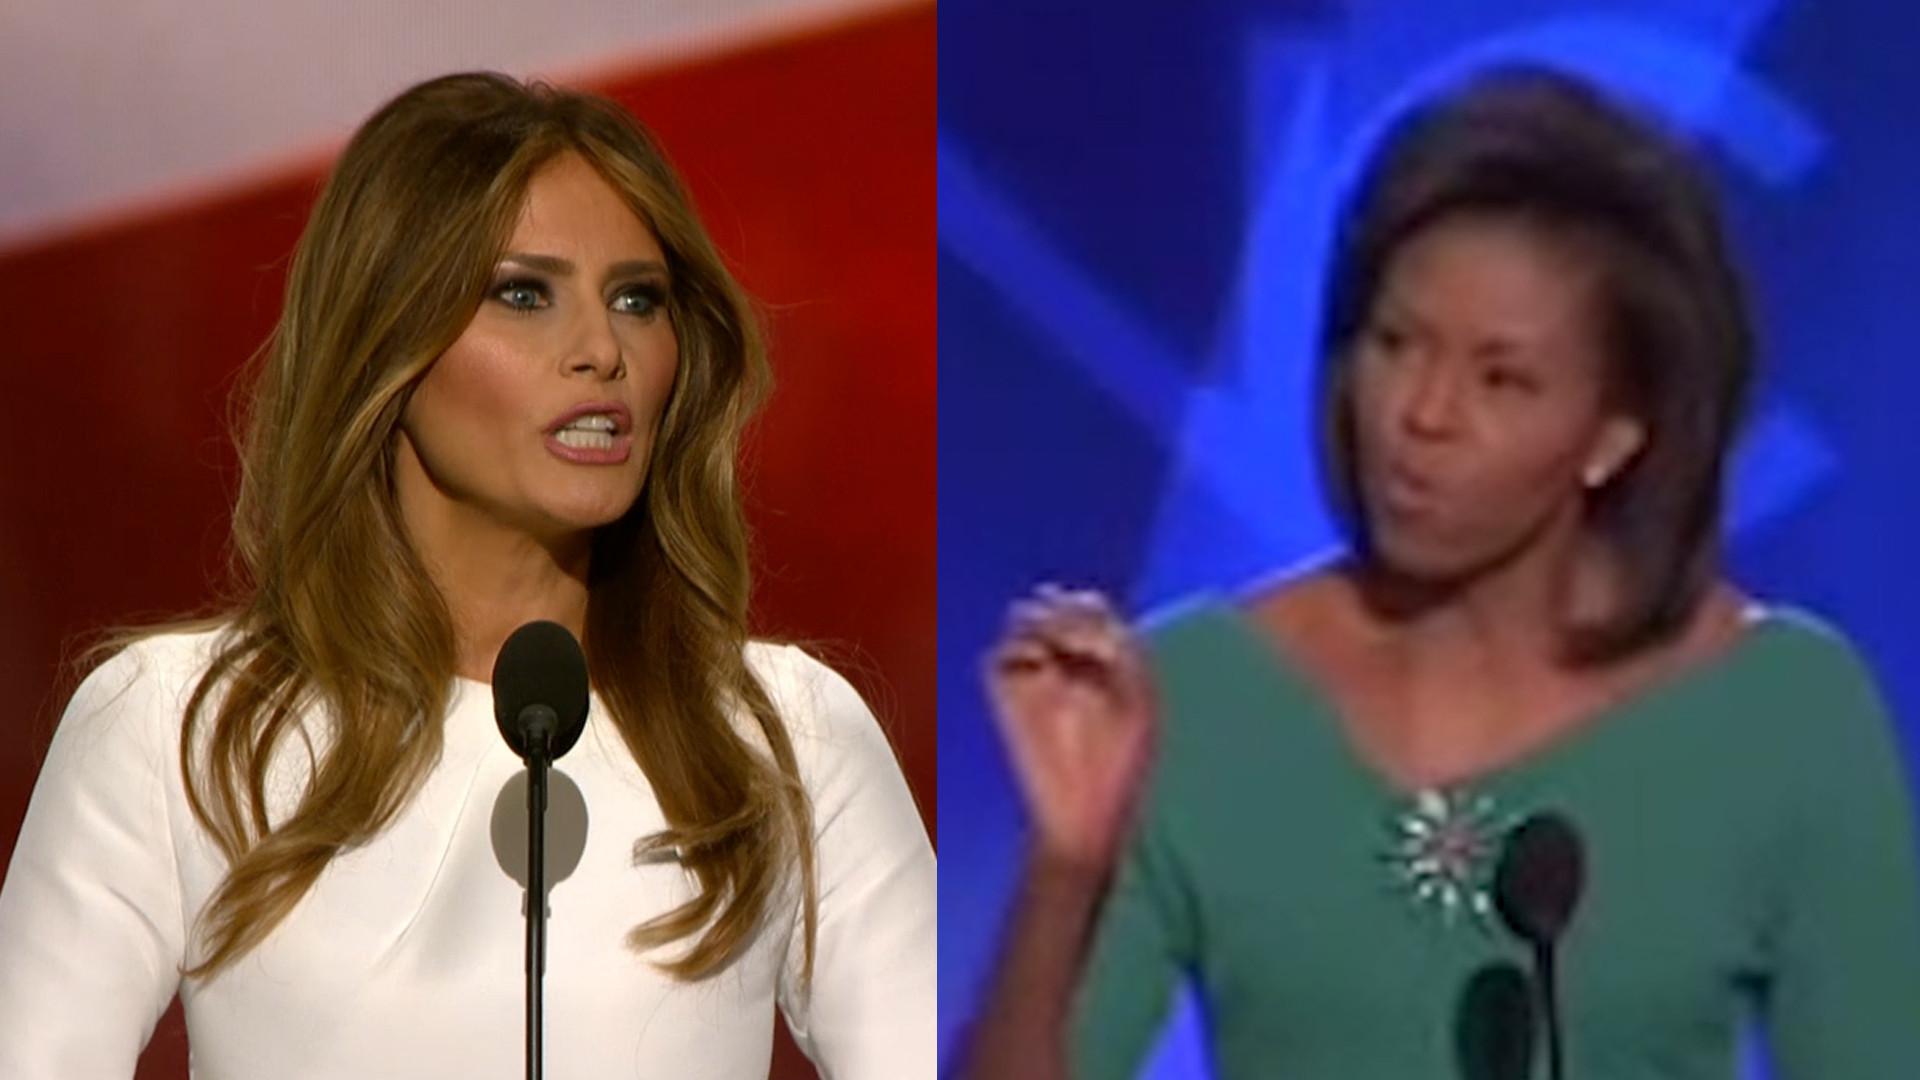 In-house speechwriter takes blame for Melania Trump's plagiarism – LA Times